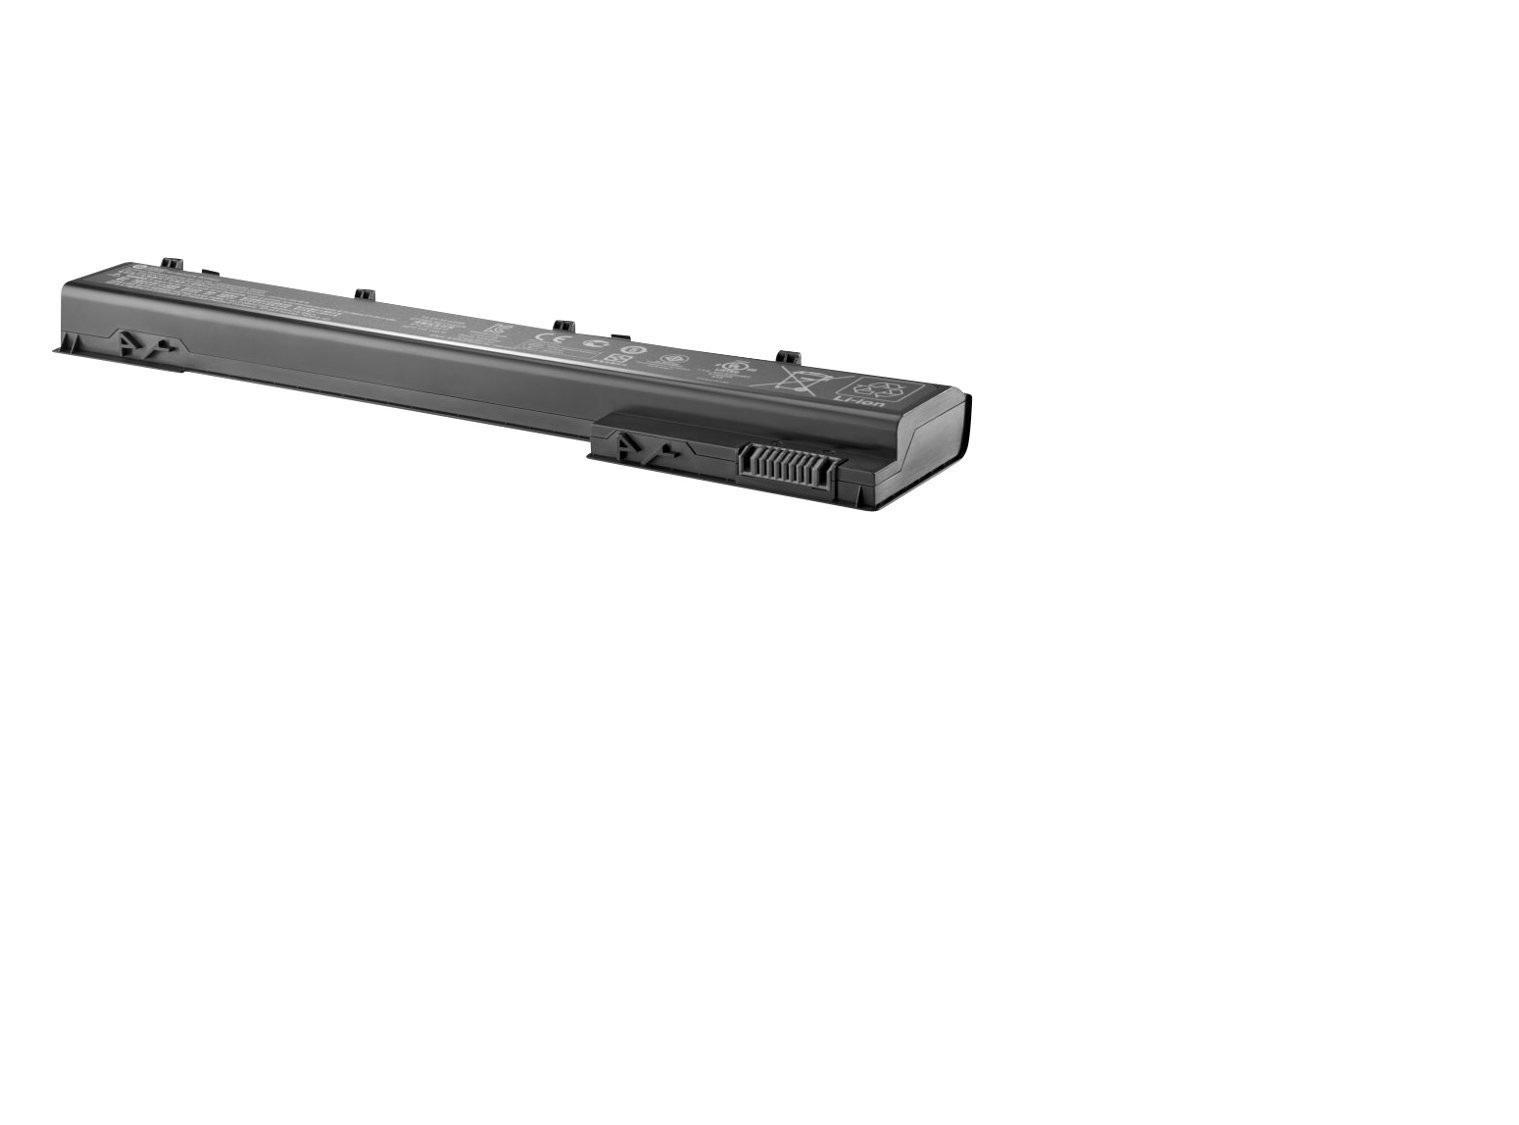 Genuine HP AR08XL Long Life Notebook Battery E7U26AA